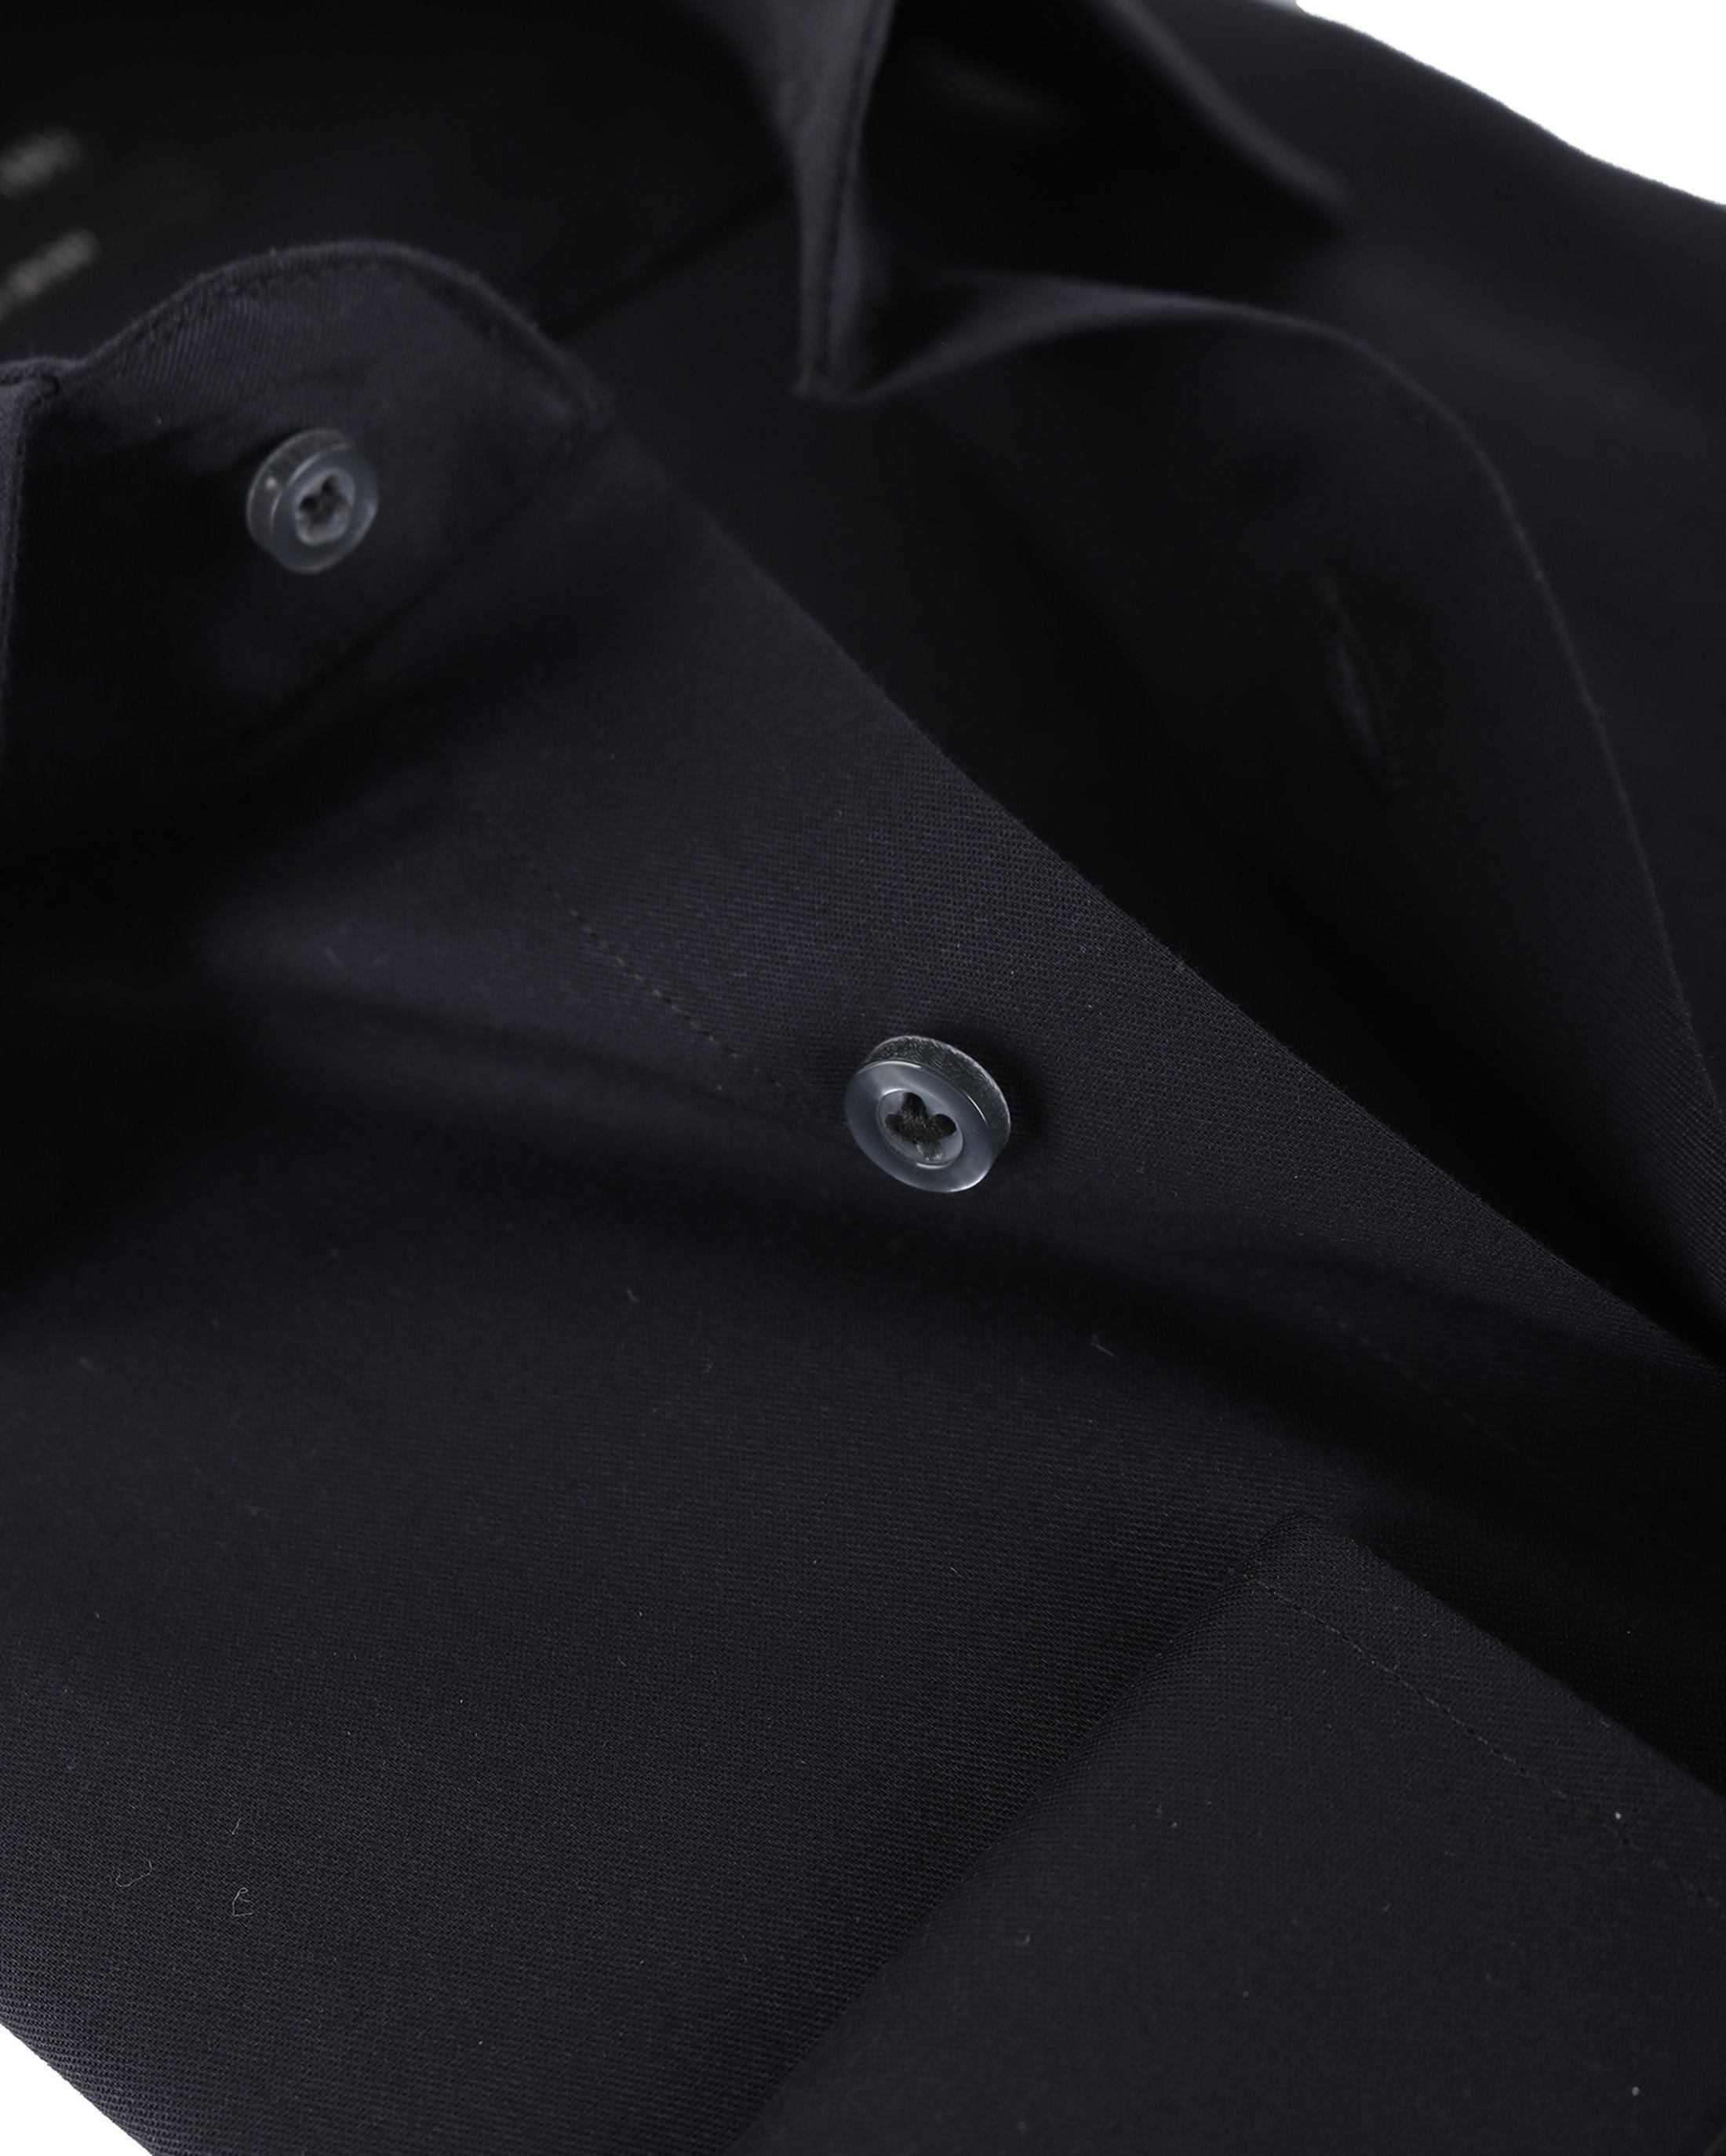 Michaelis Overhemd Zwart SL7 foto 2